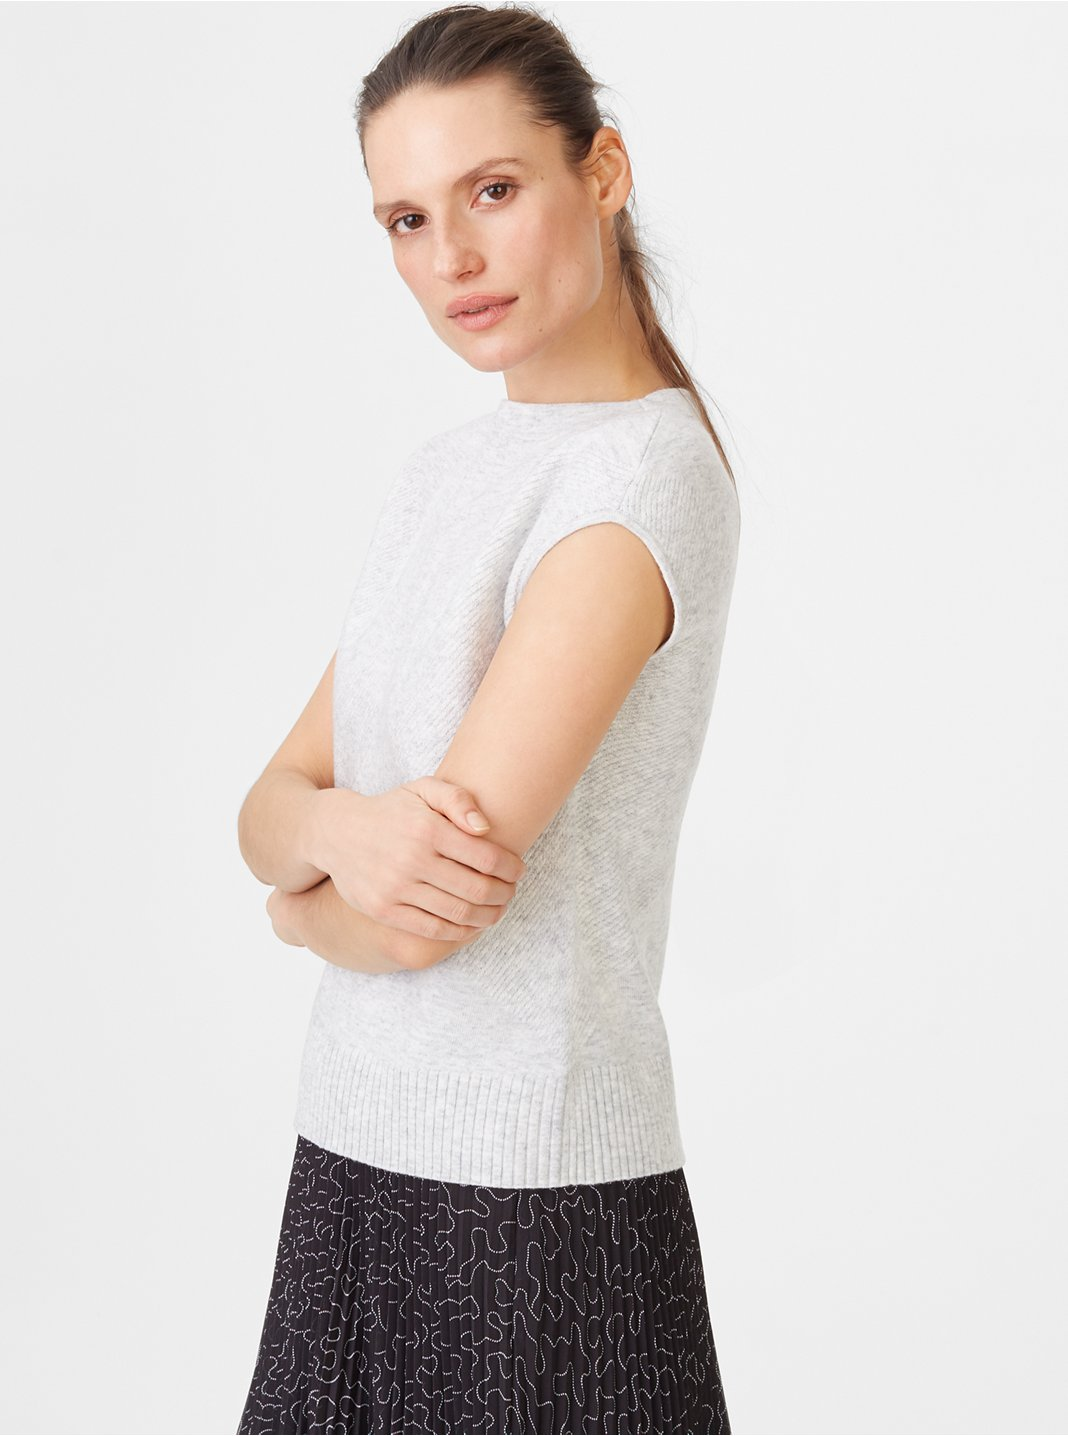 Fretta Sweater